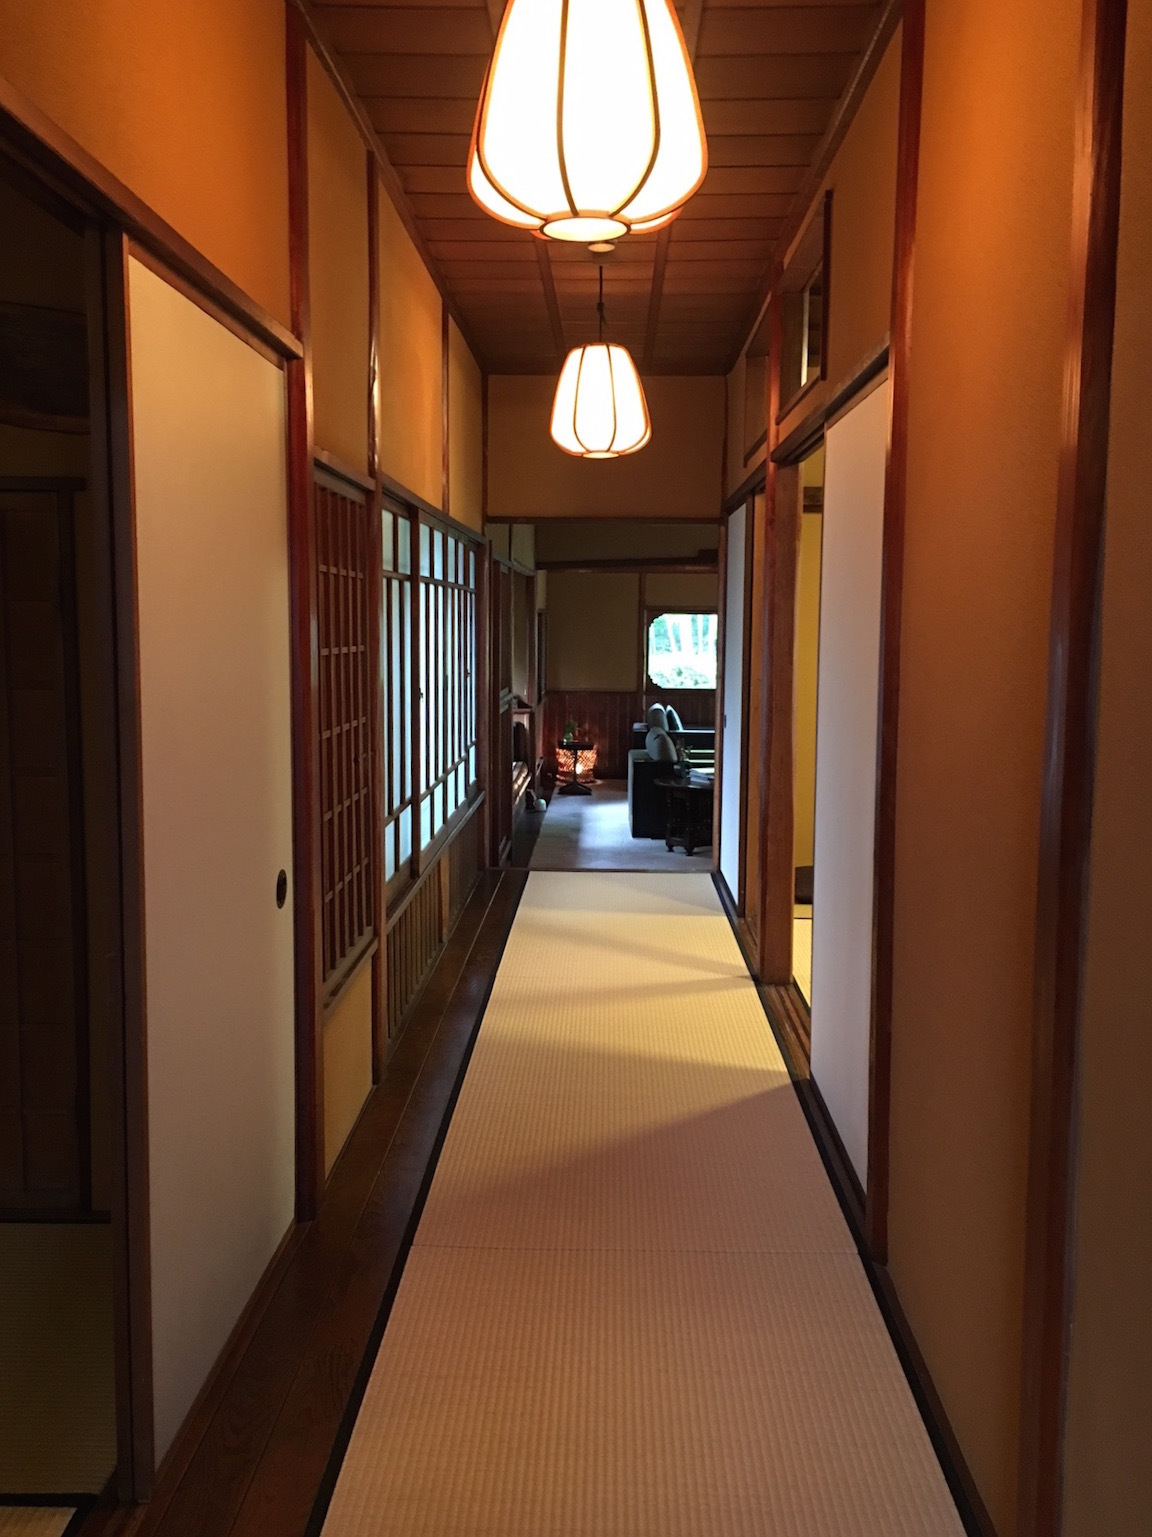 日本の旅、その4、沼津倶楽部/ Japan Trip 4, Numazu Club_e0310424_14121517.jpg